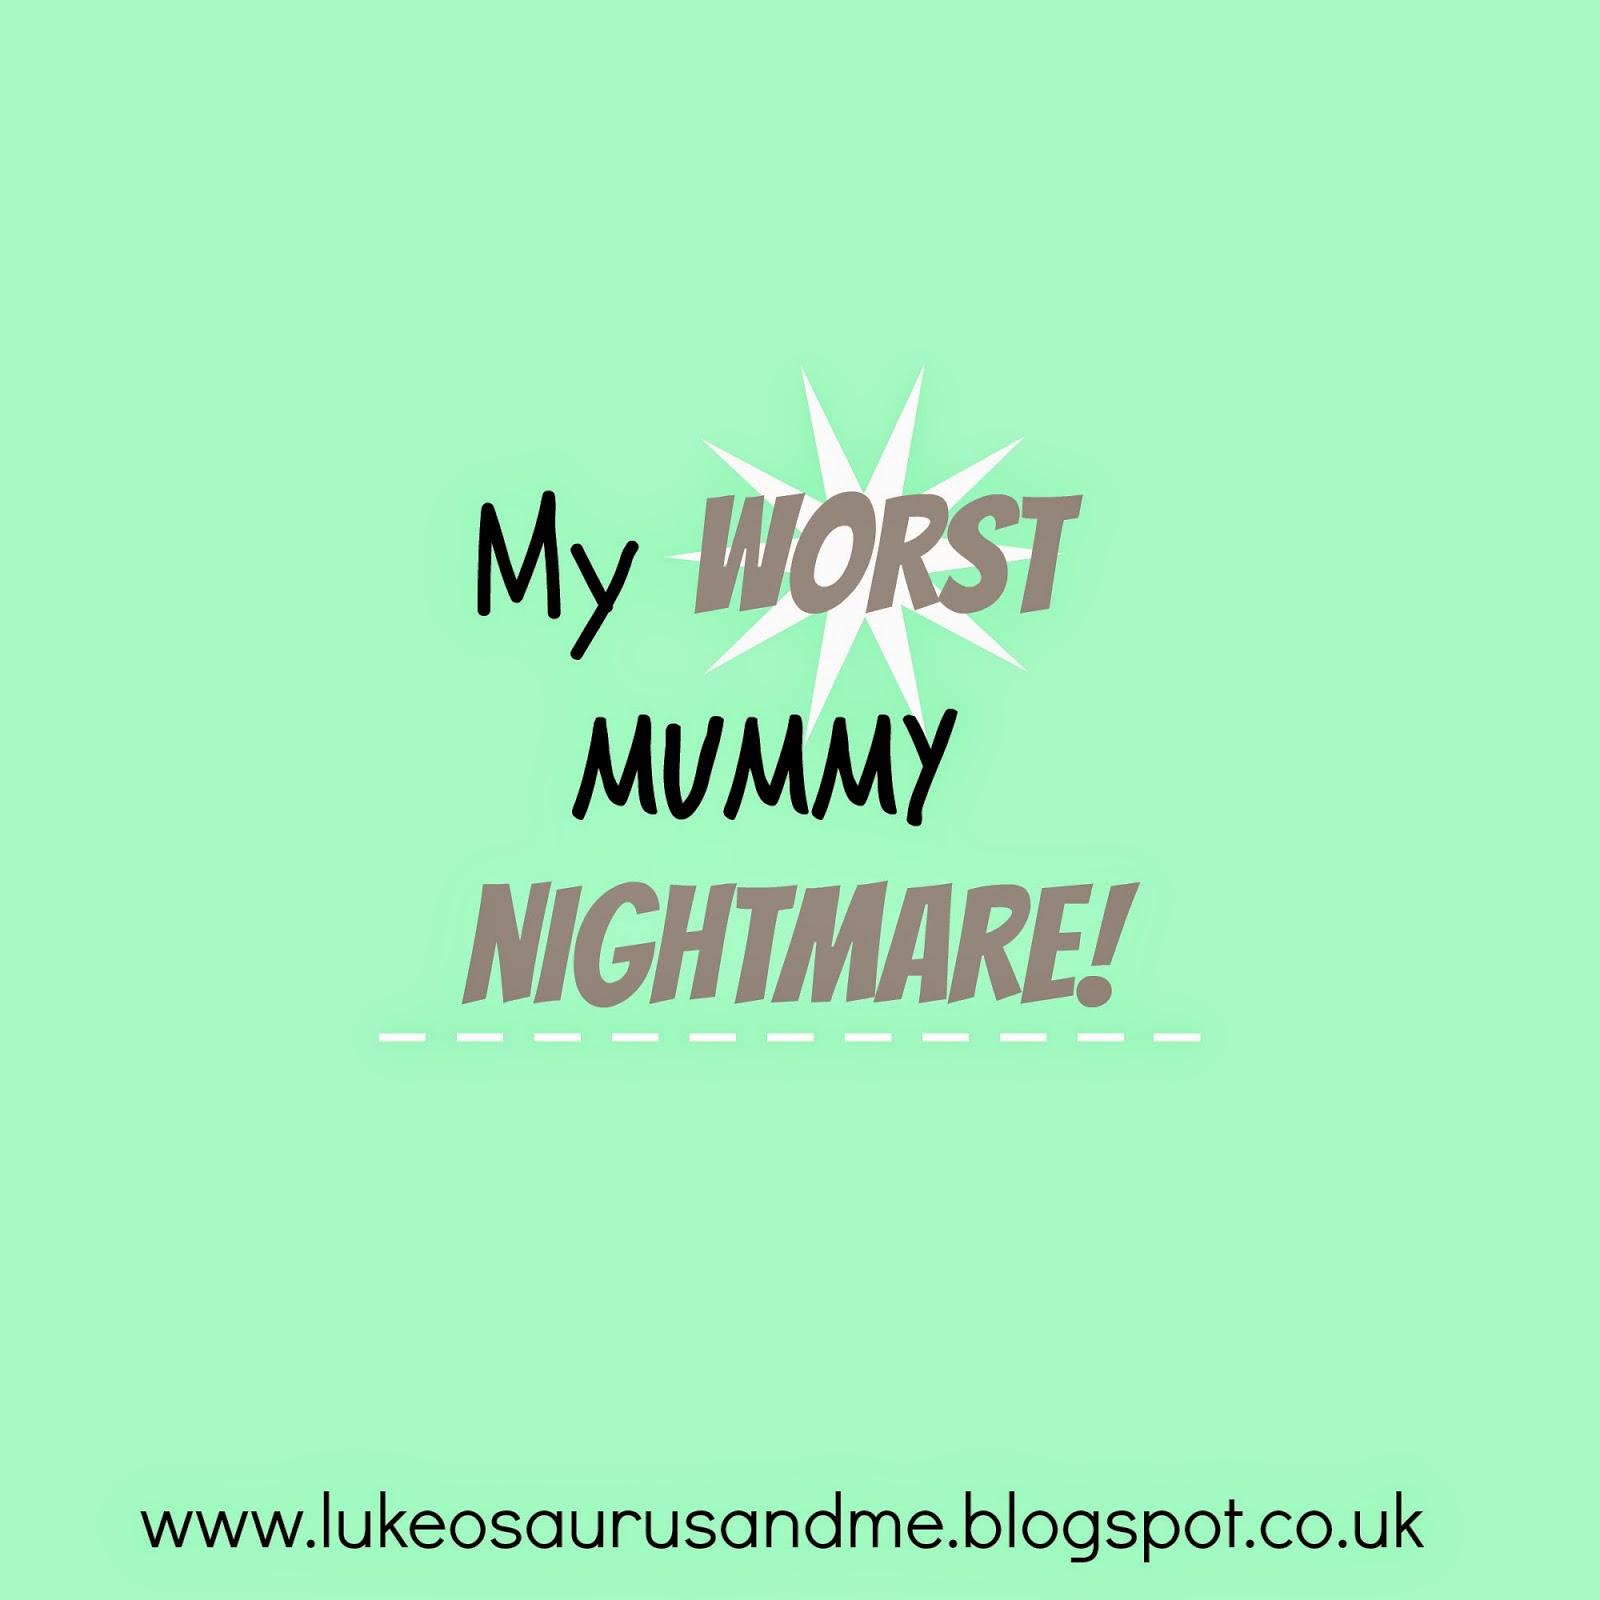 My Wosrt Mummy Nightmare! http://lukeosaurusandme.blogspot.co.uk/2015/02/my-worst-mummy-nightmare.html #worstmummynightmare